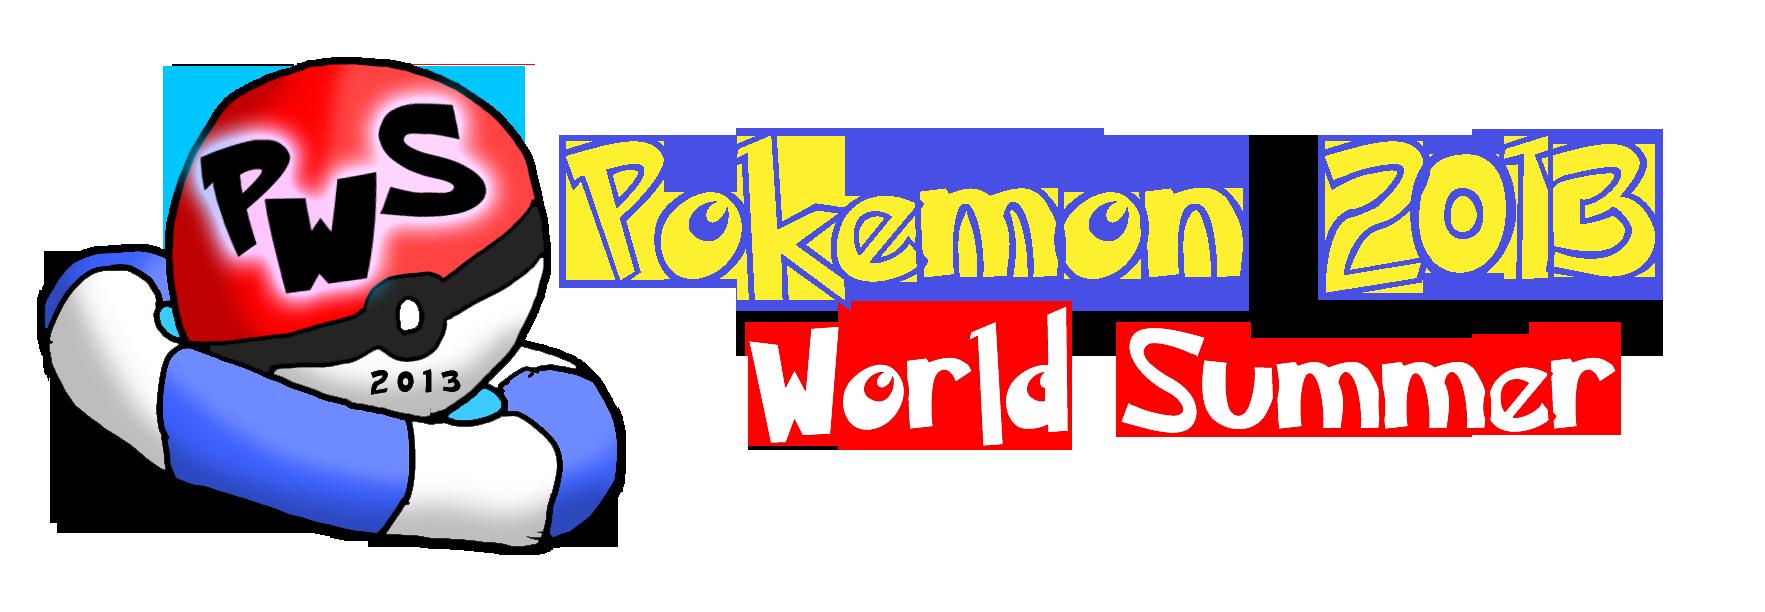 Pokemon World Summer 2013 Logo by Xero-J